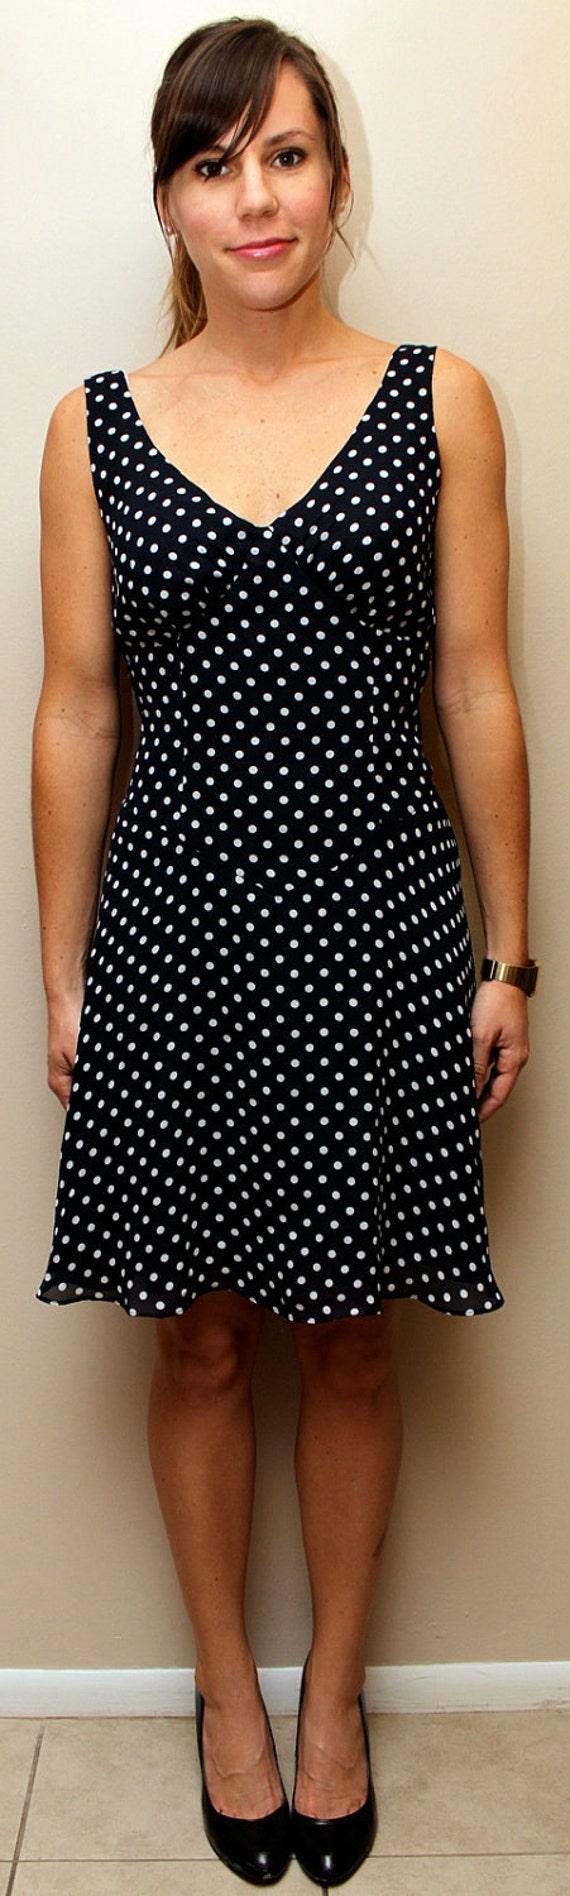 Vintage 60s Inspired Navy Blue Polka Dot Dress Size 2-4 SALE